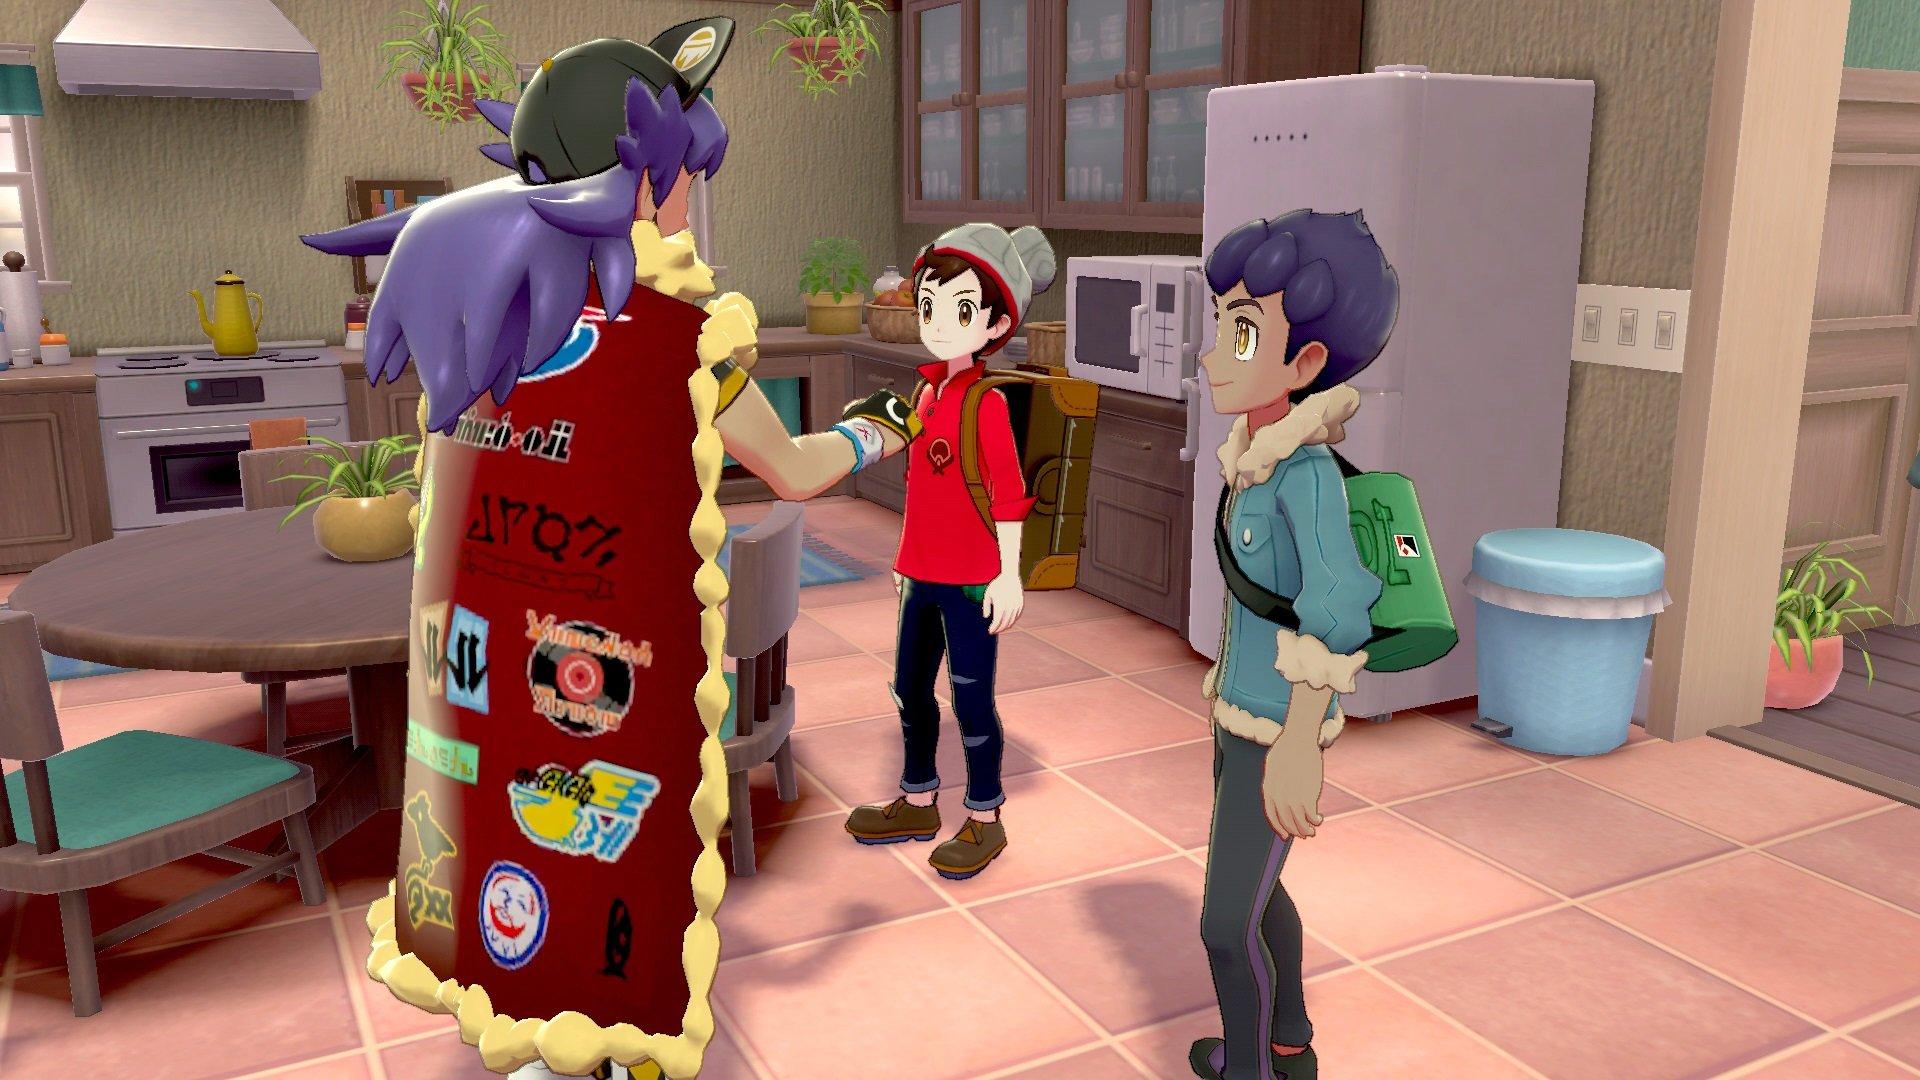 Comment sauter des cutscenes dans Pokemon Sword and Shield